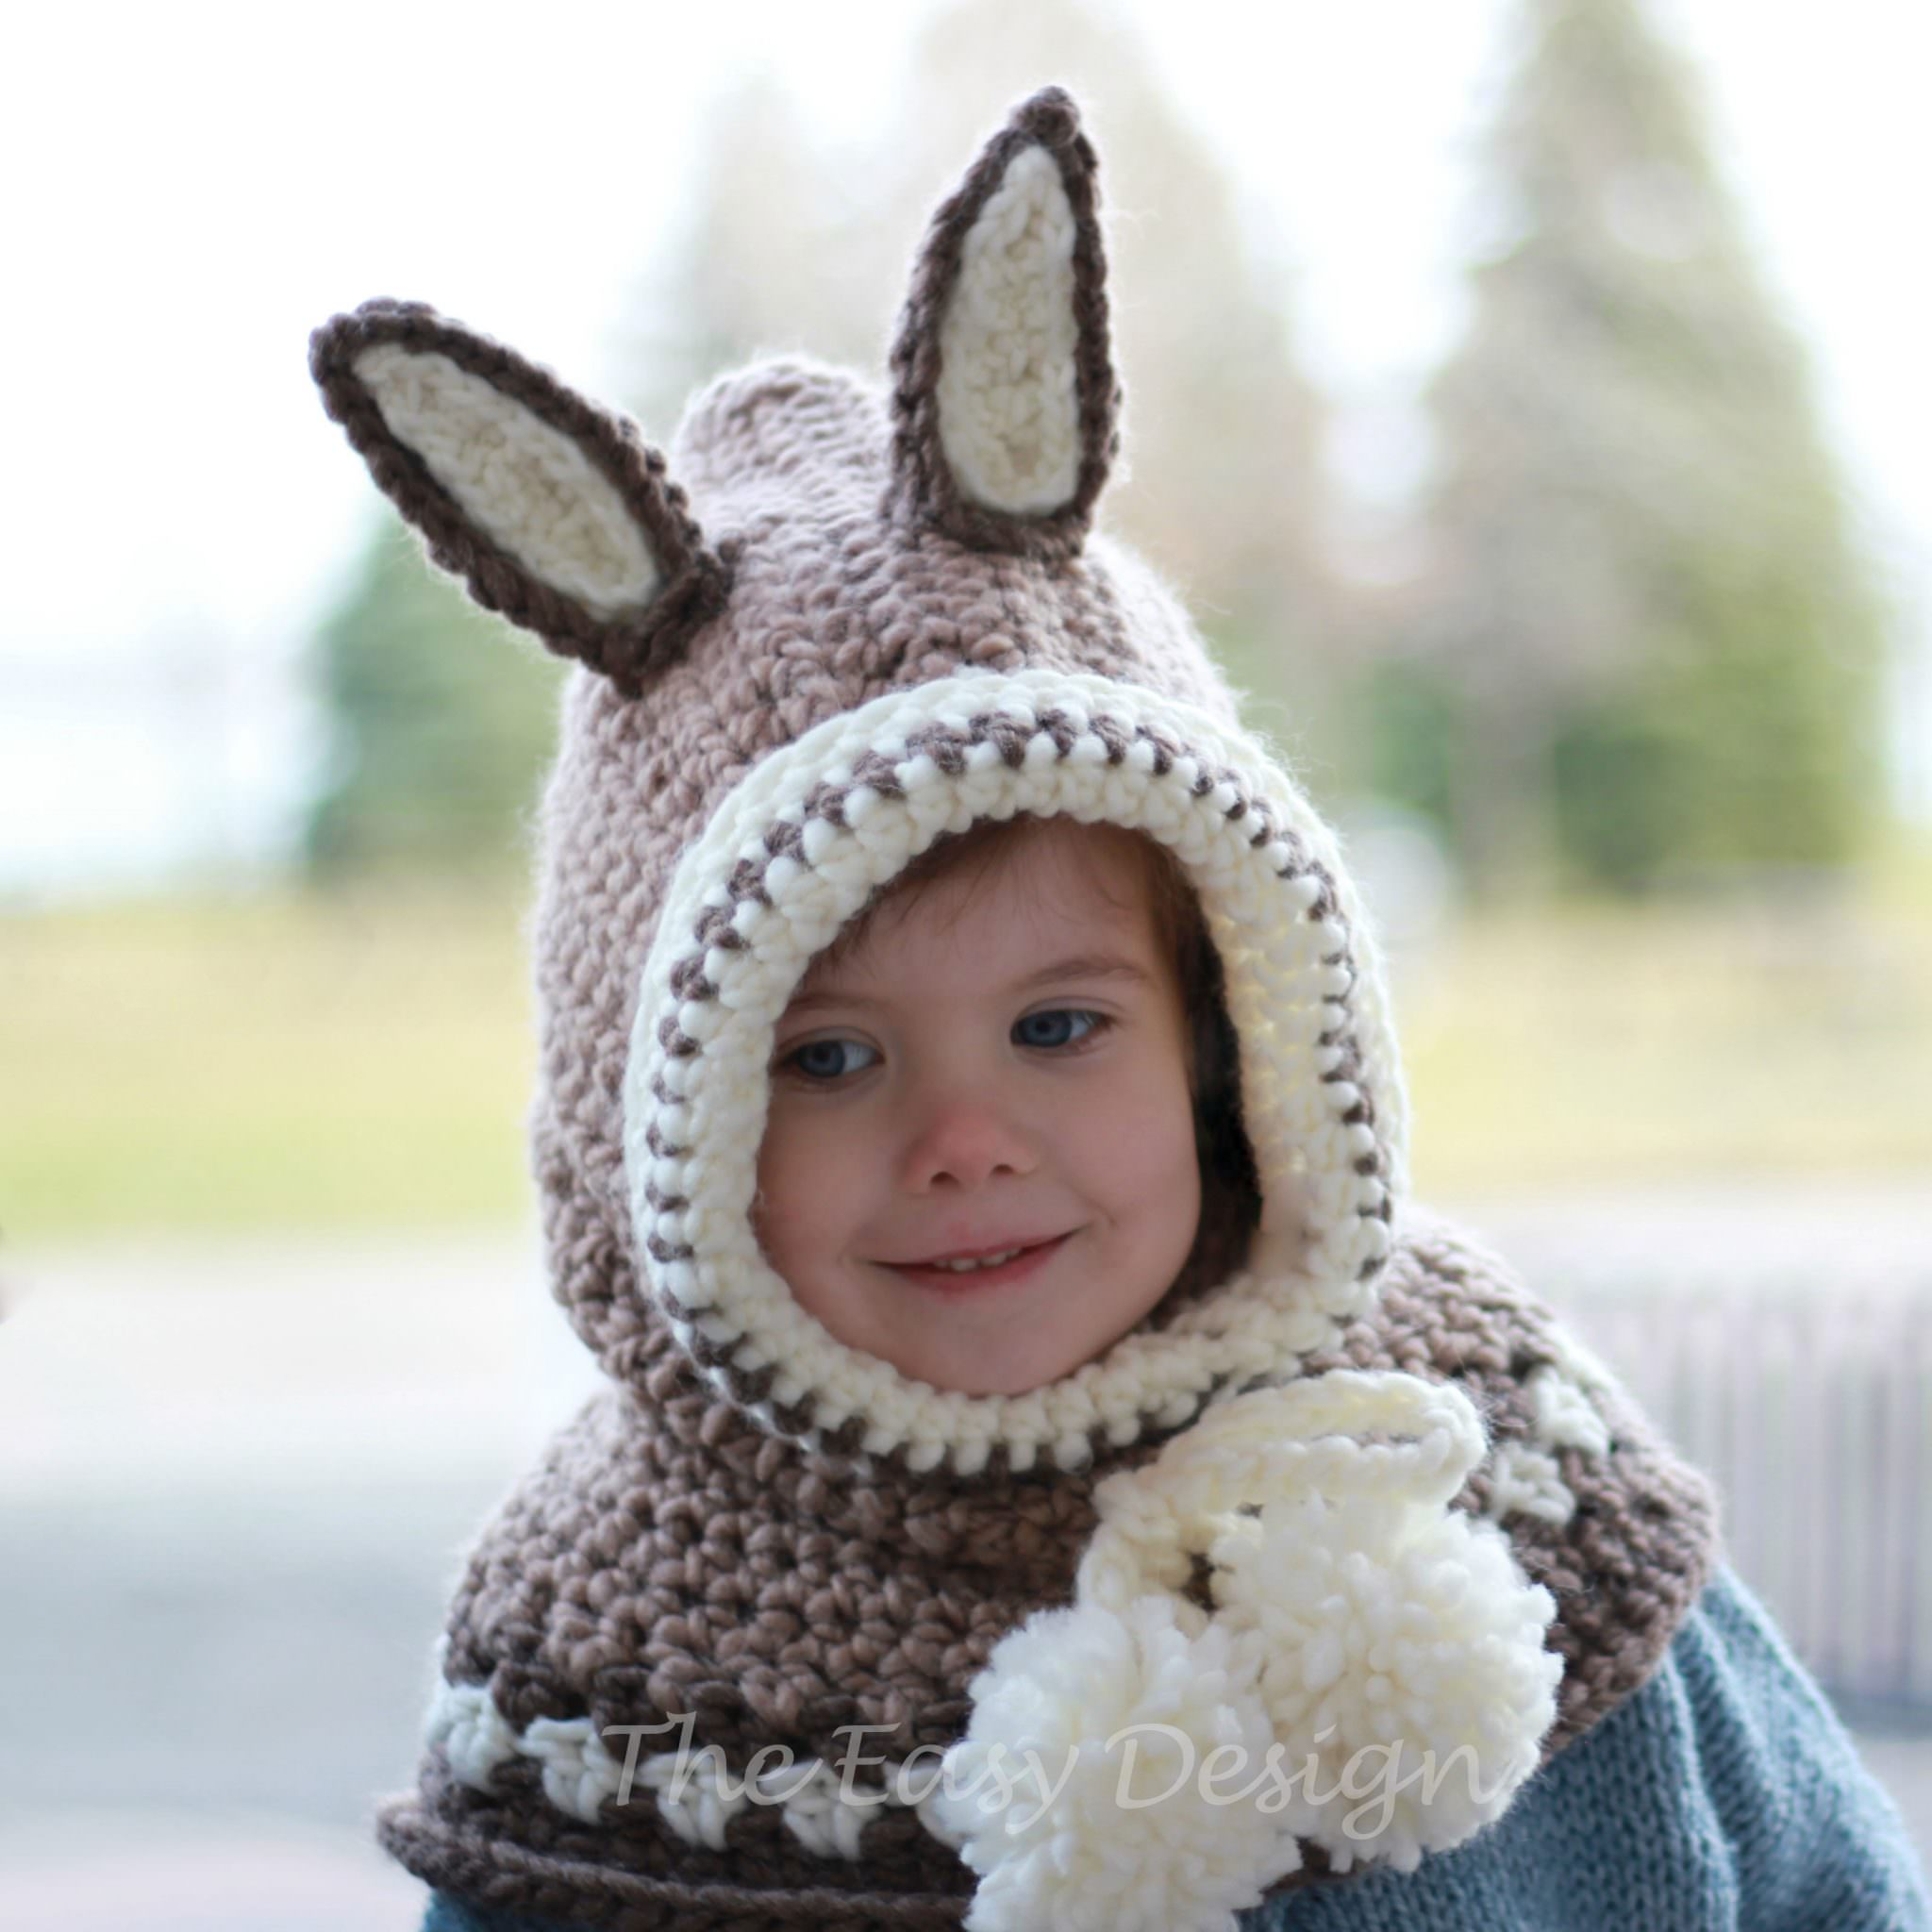 Ruby Rabbit Hooded Cowl Crochet Pattern The Easy Design